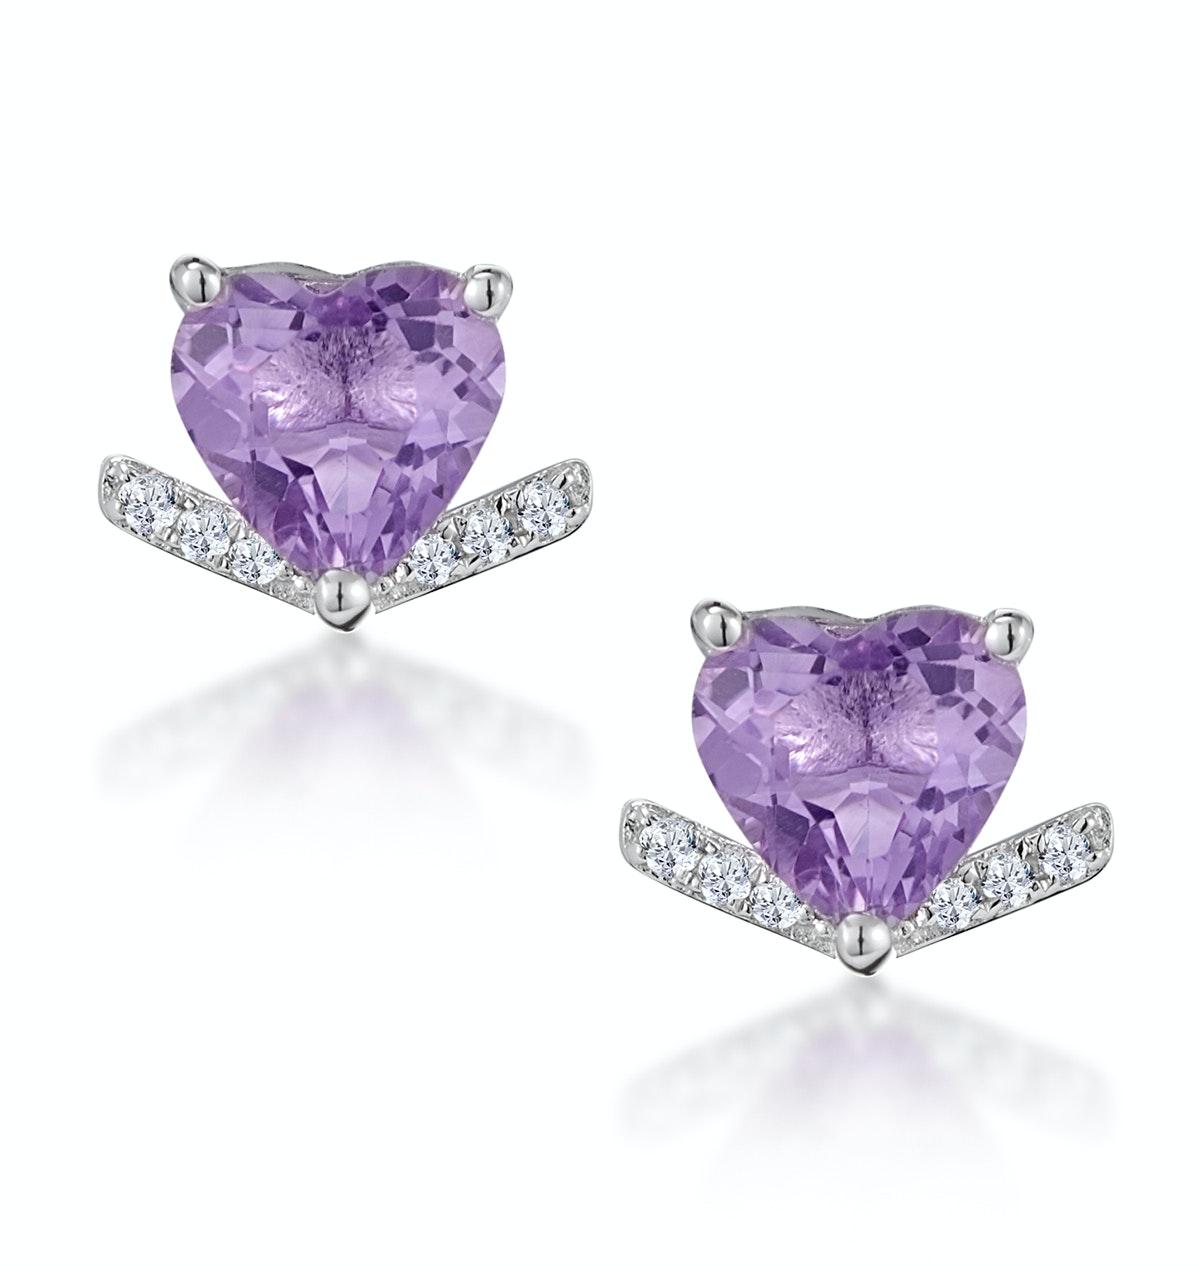 Stellato Amethyst and Diamond Heart Earrings in 9K White Gold